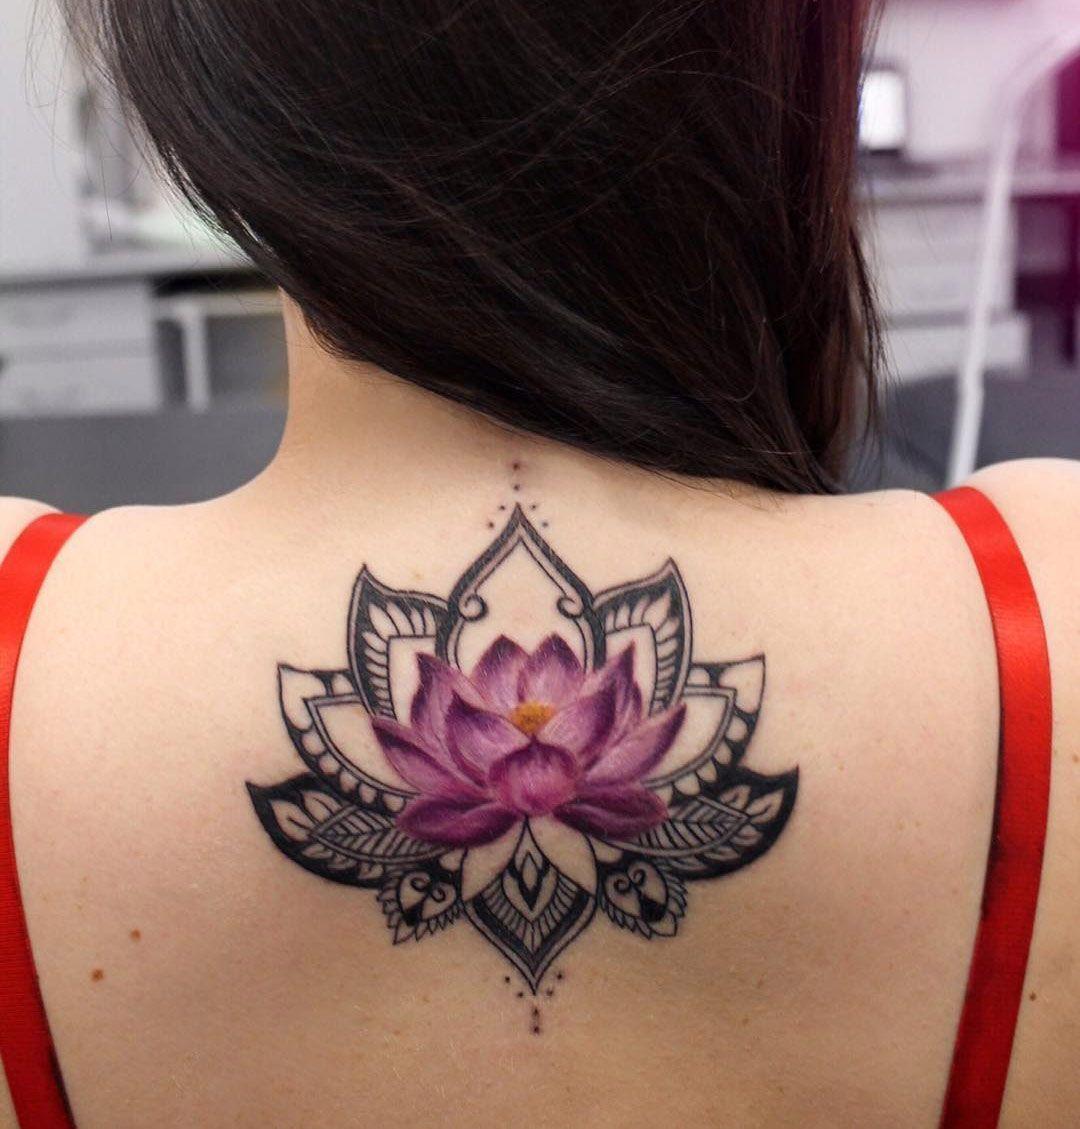 Color lotus flower black mandala flowertattoodesigns tattoos color lotus flower black mandala flowertattoodesigns izmirmasajfo